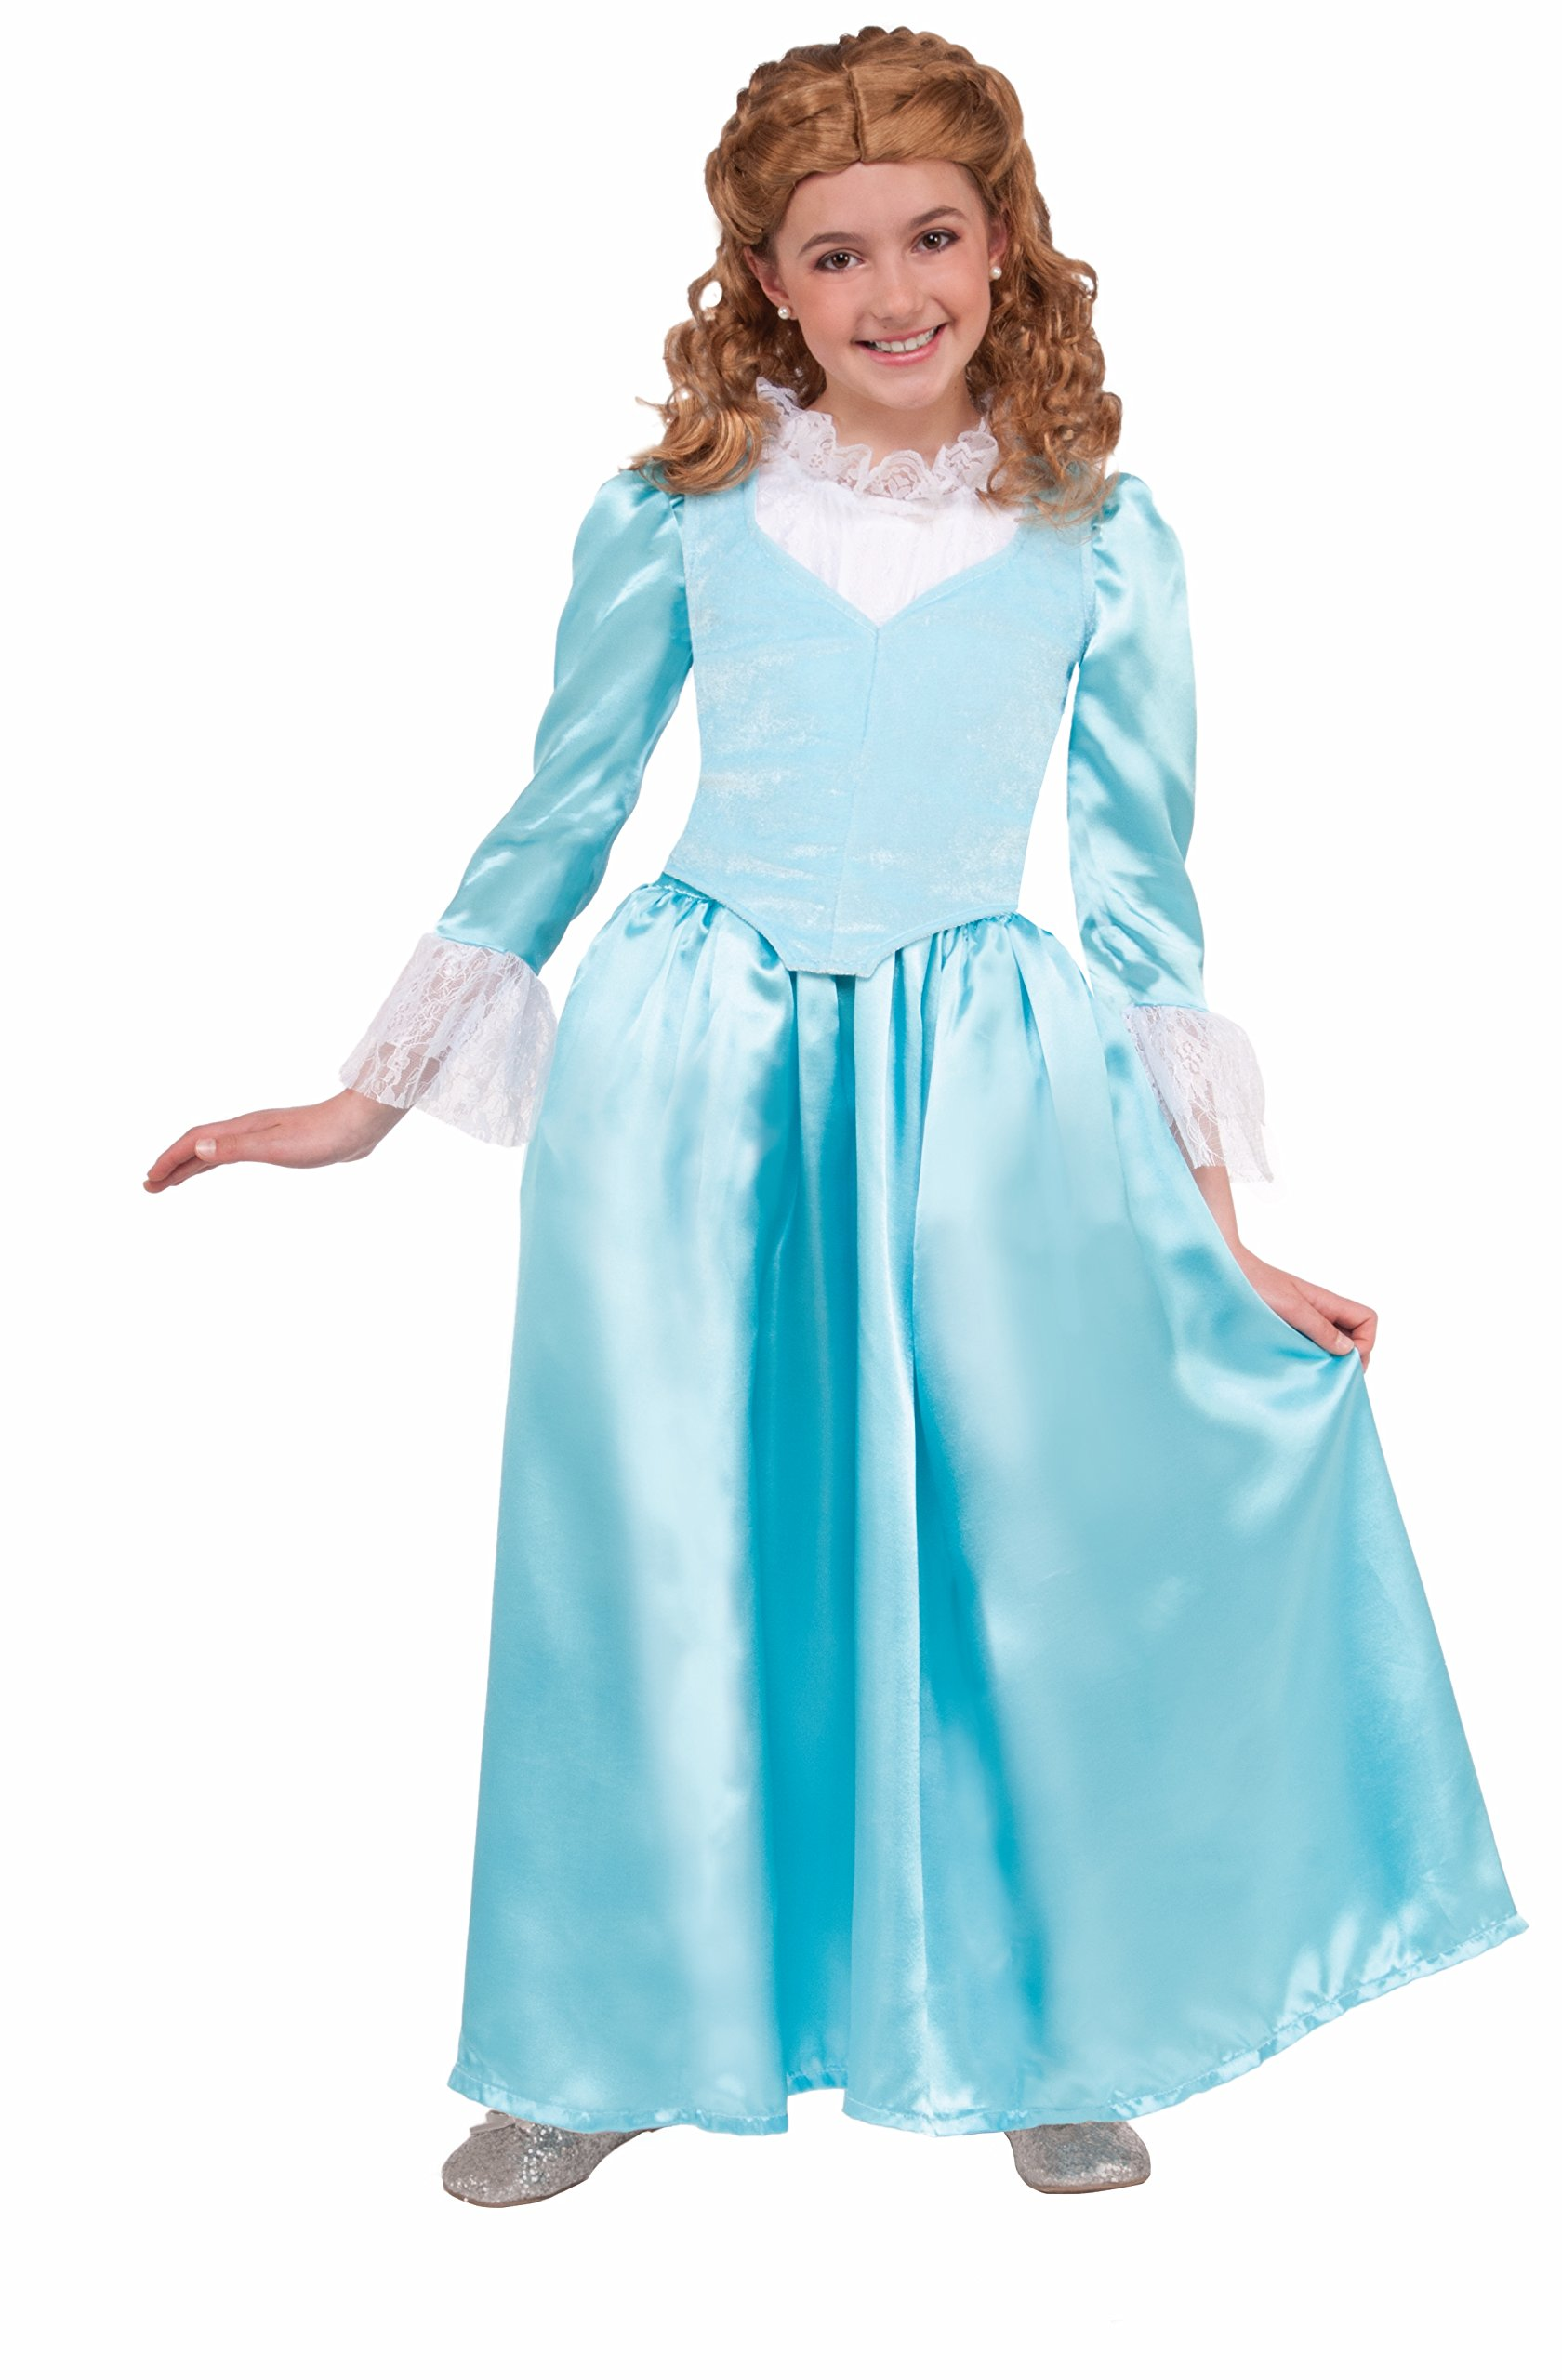 Forum Novelties Kids Colonial Lady Costume, Blue, Medium